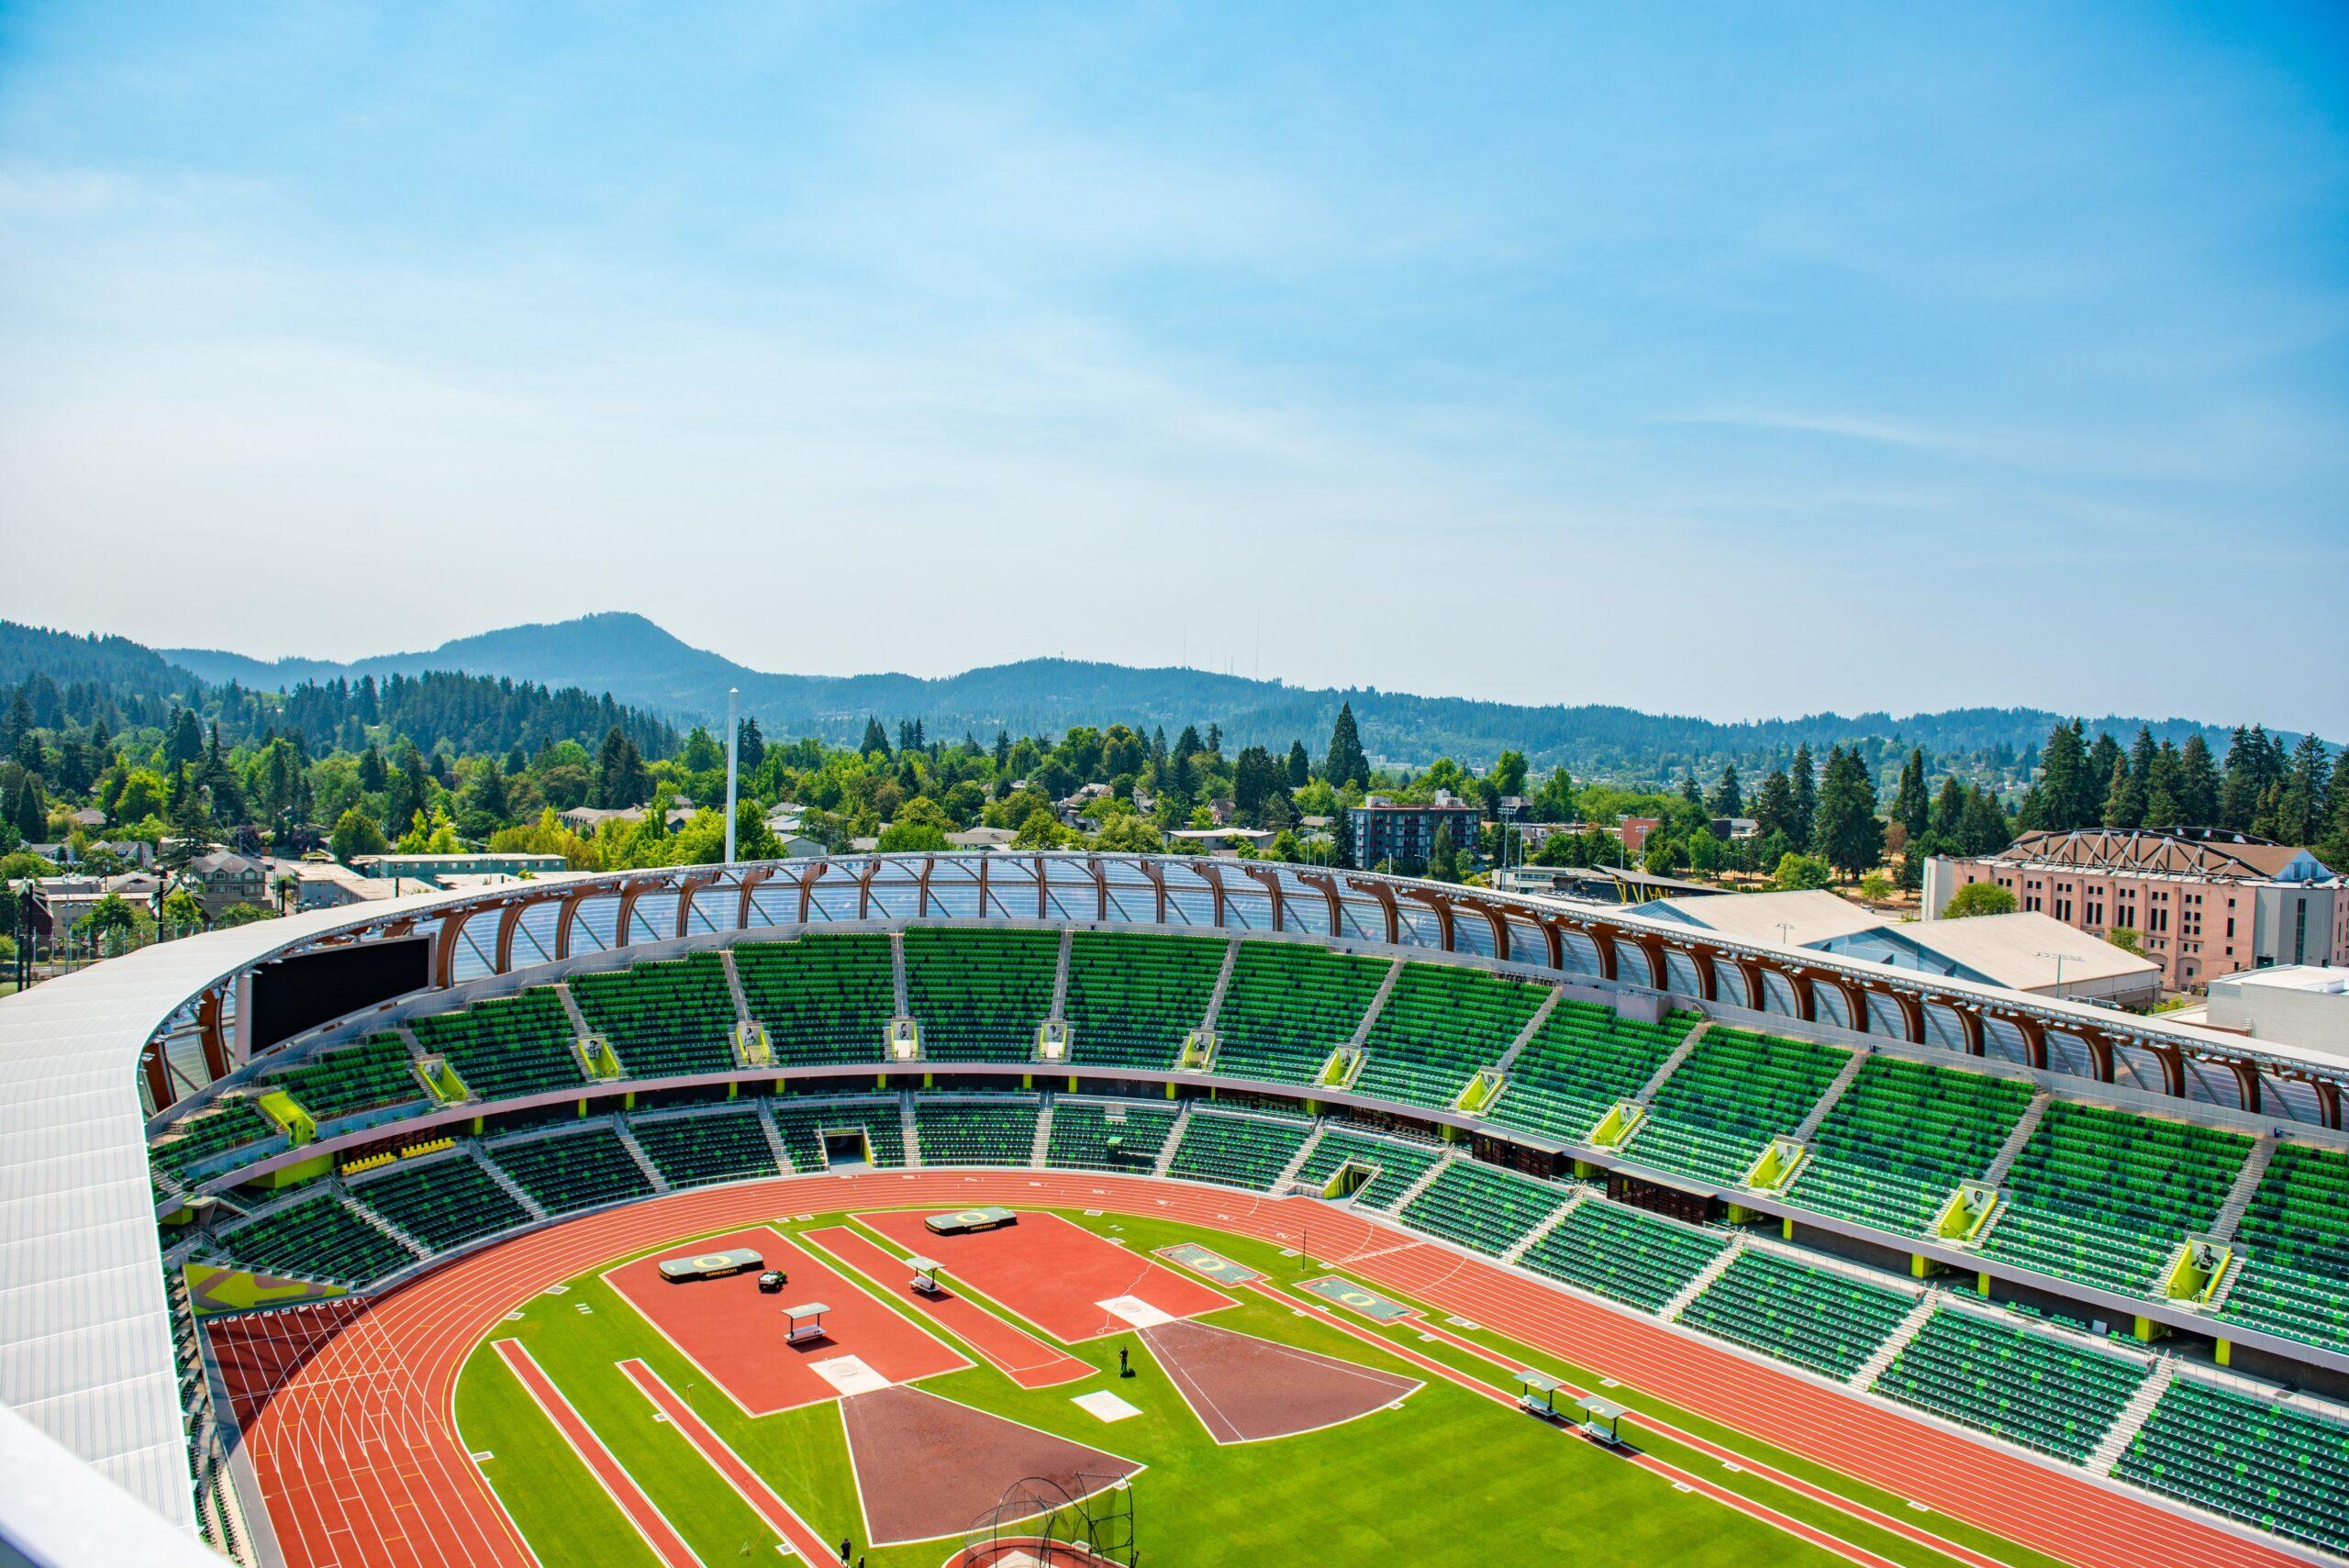 Hayward Field at the University of Oregon